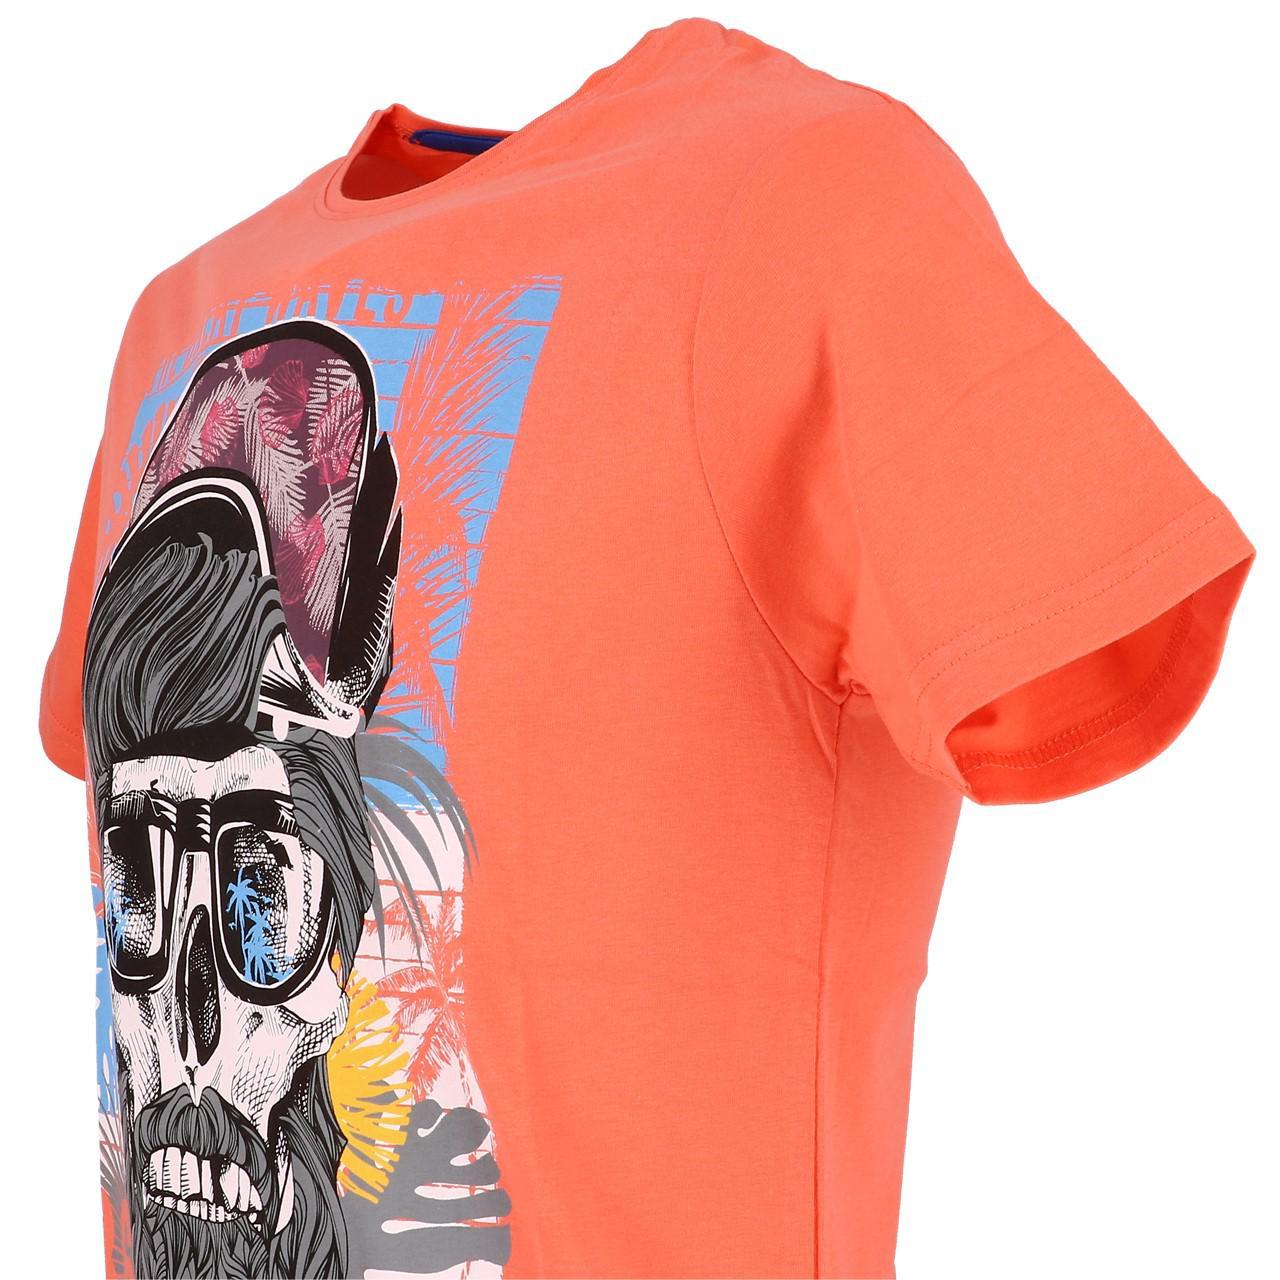 Short-La-maison-blaggio-Mably-Hot-Coral-Mc-Tee-Orange-93614 thumbnail 3